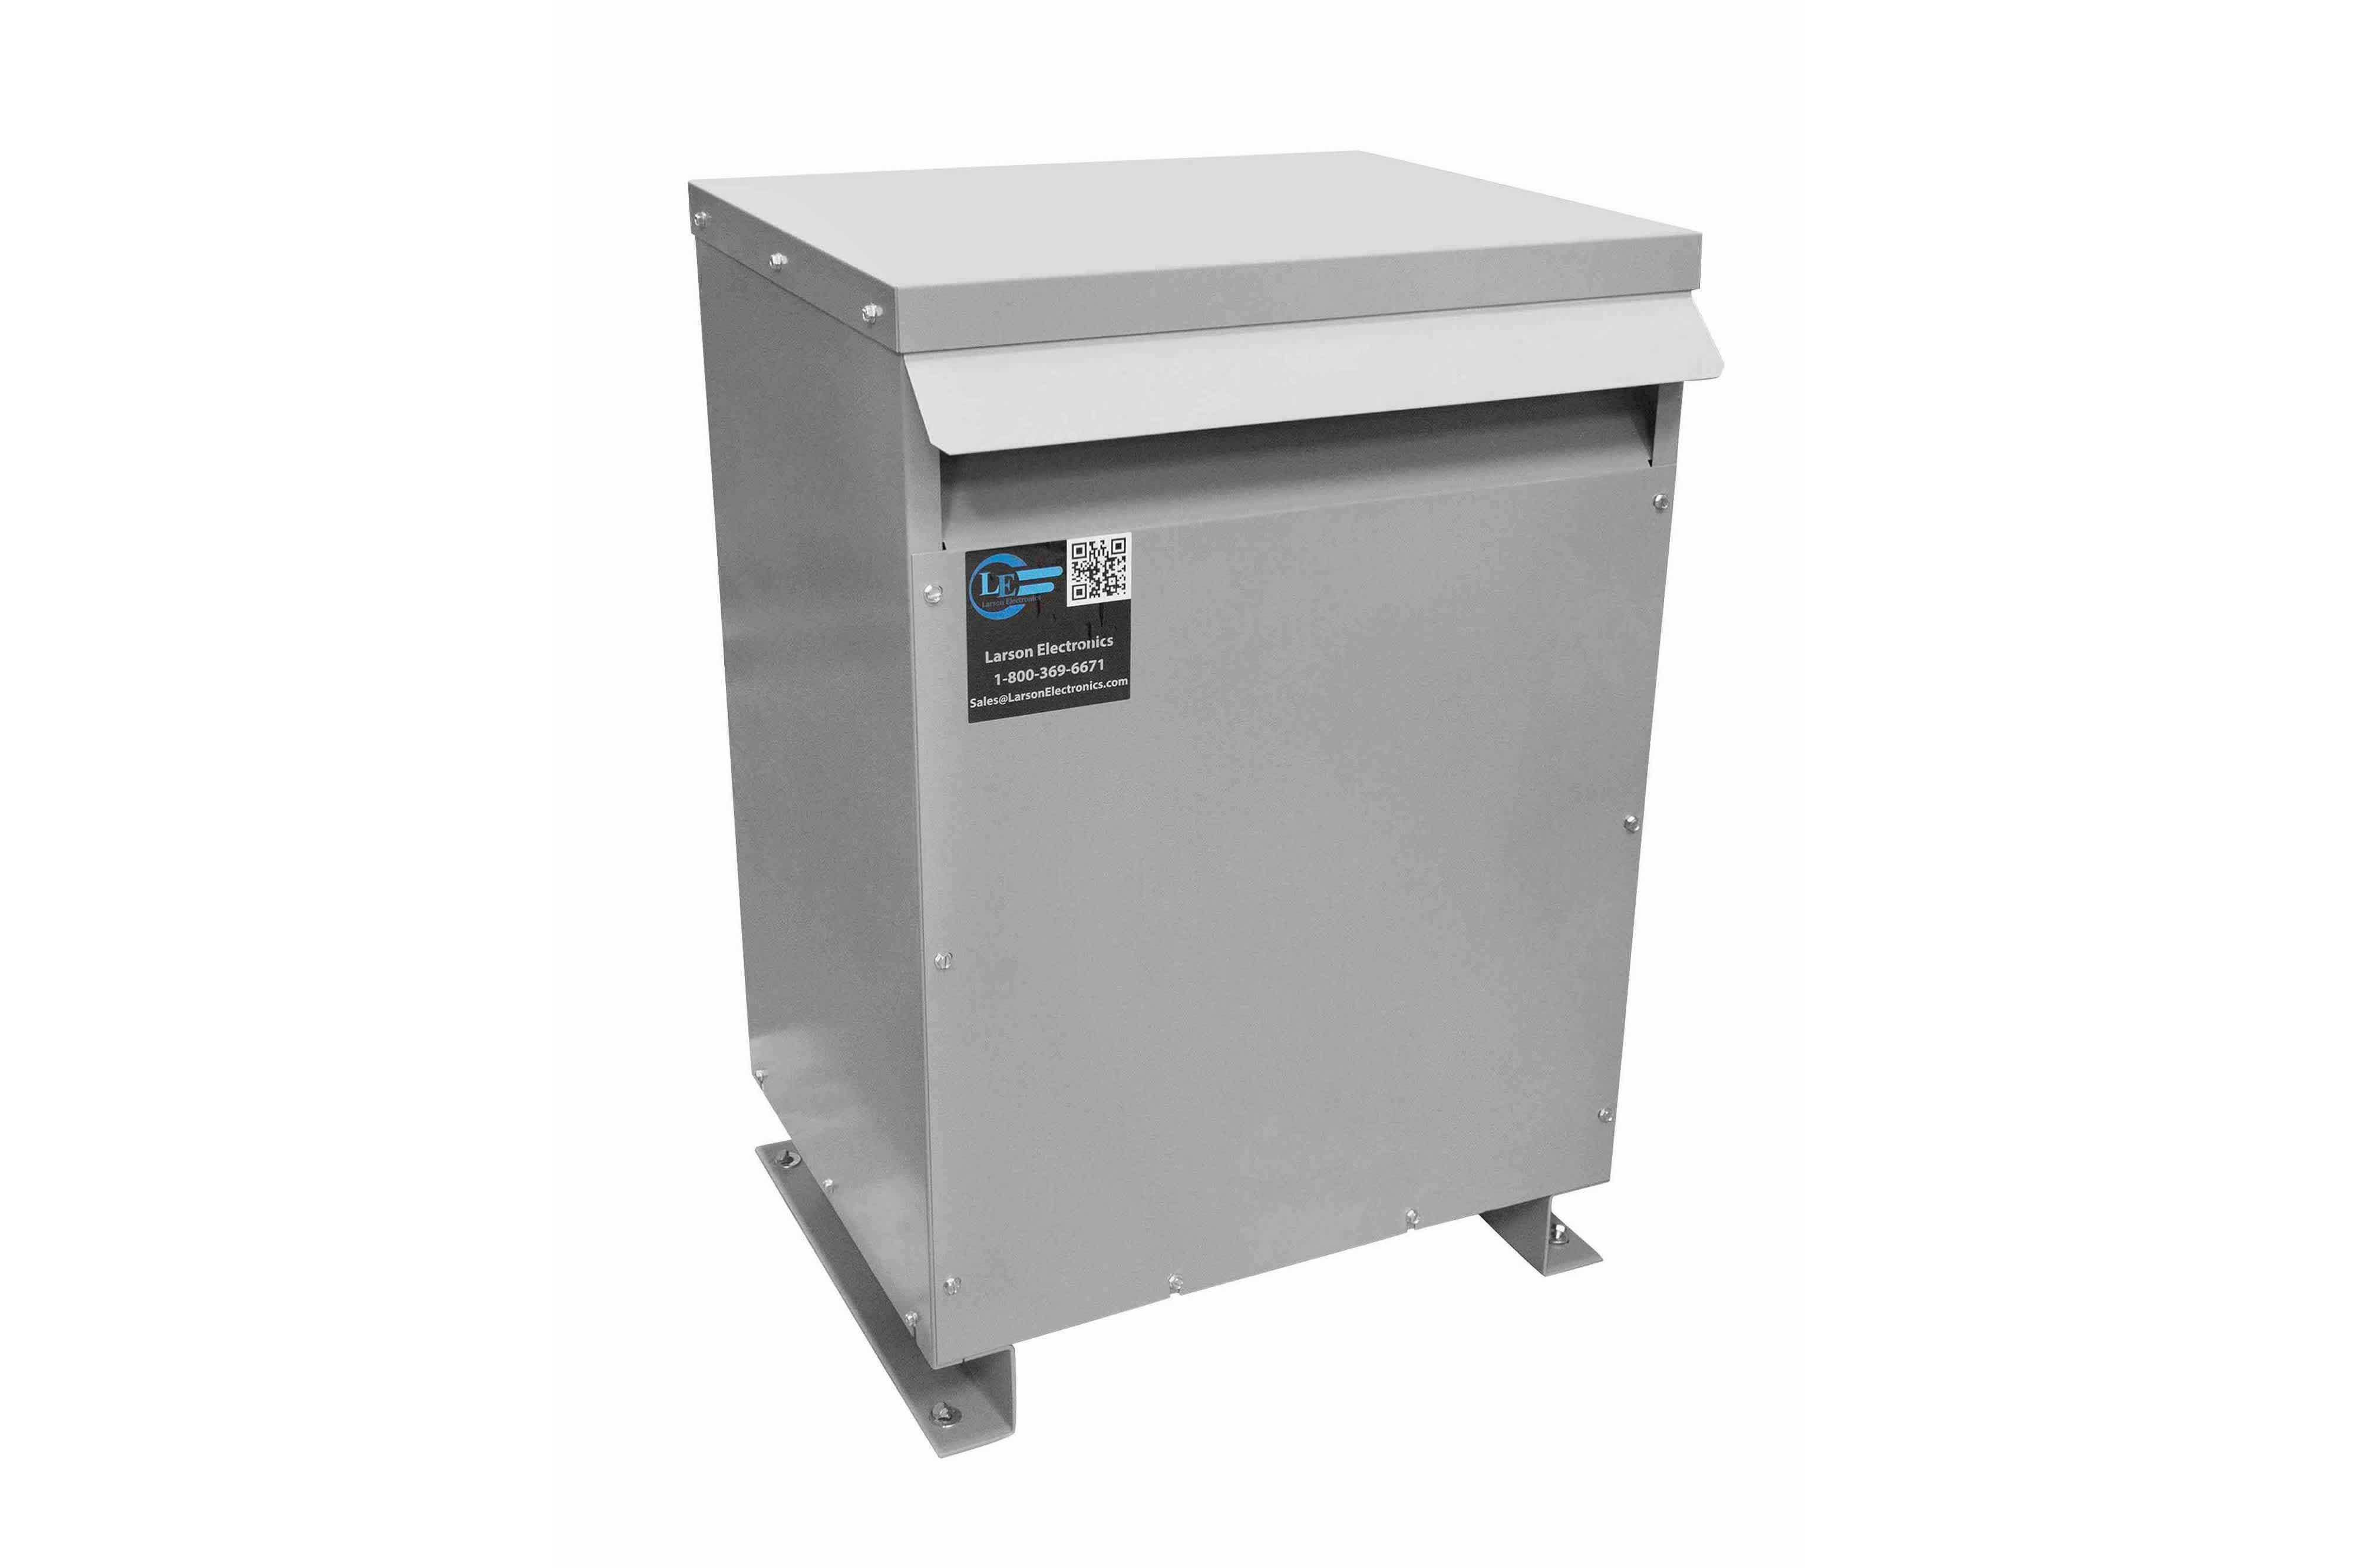 60 kVA 3PH Isolation Transformer, 600V Wye Primary, 400Y/231 Wye-N Secondary, N3R, Ventilated, 60 Hz